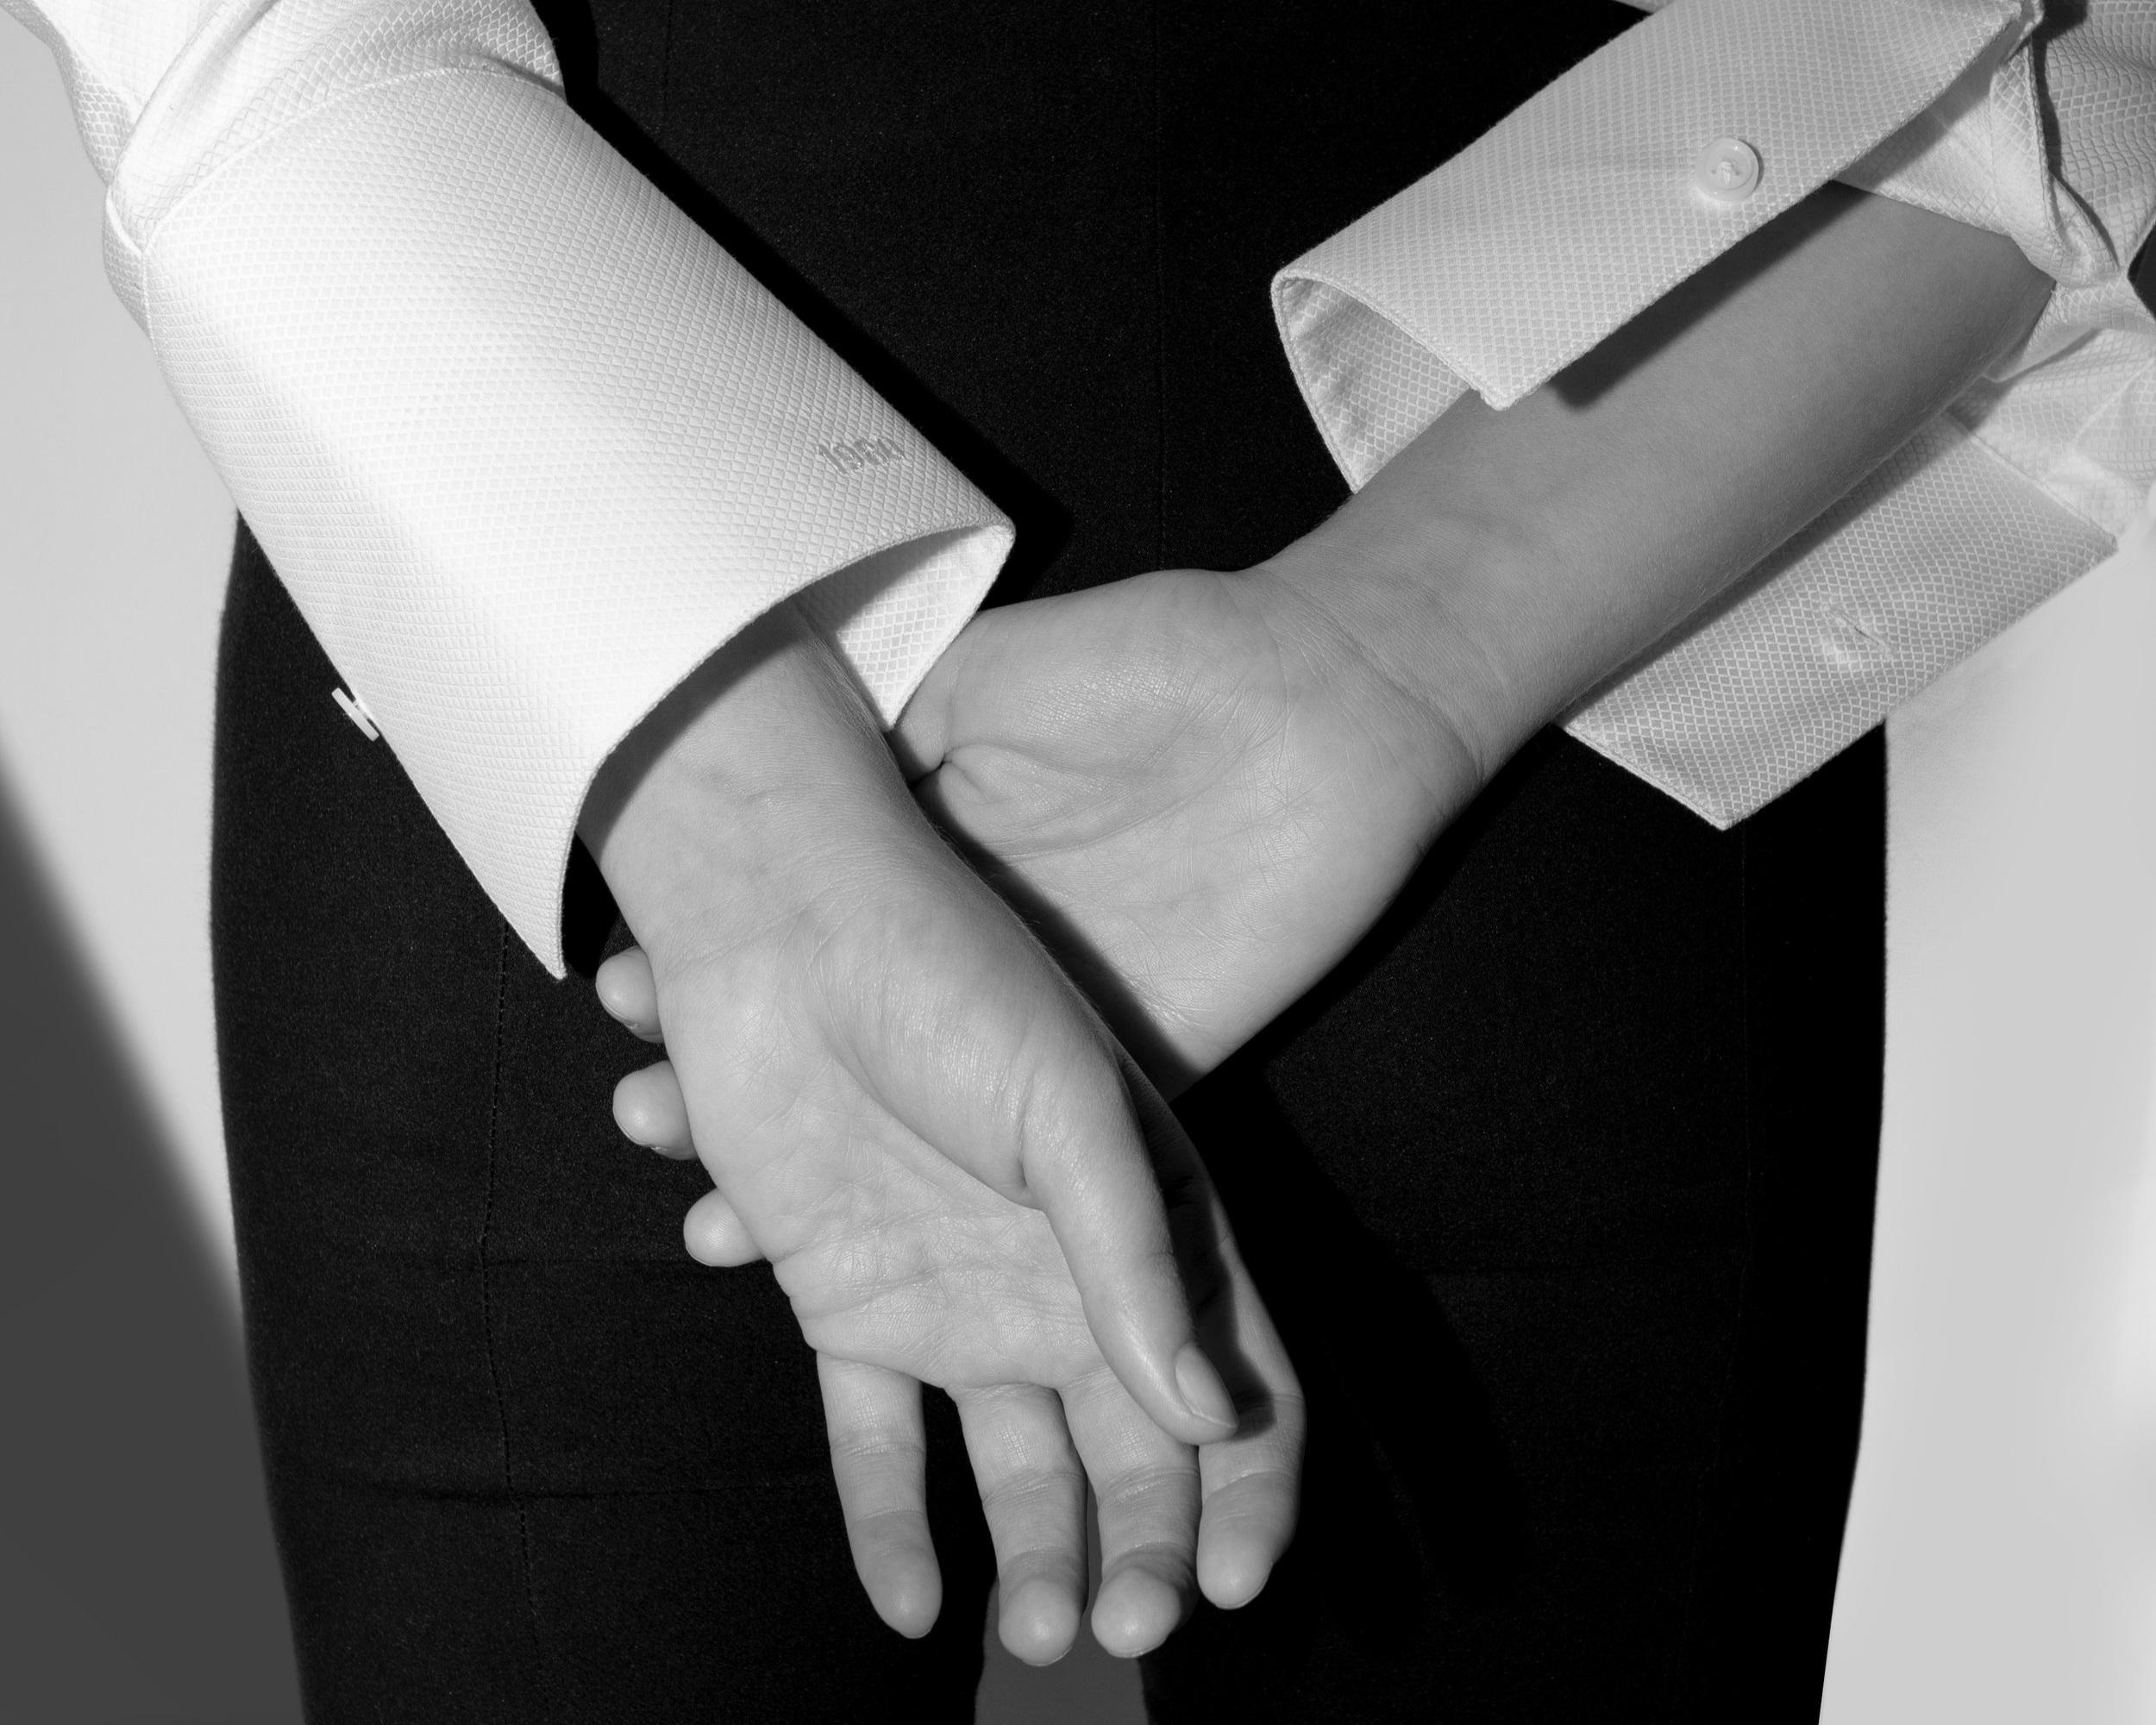 Womens_Hands_French.jpg